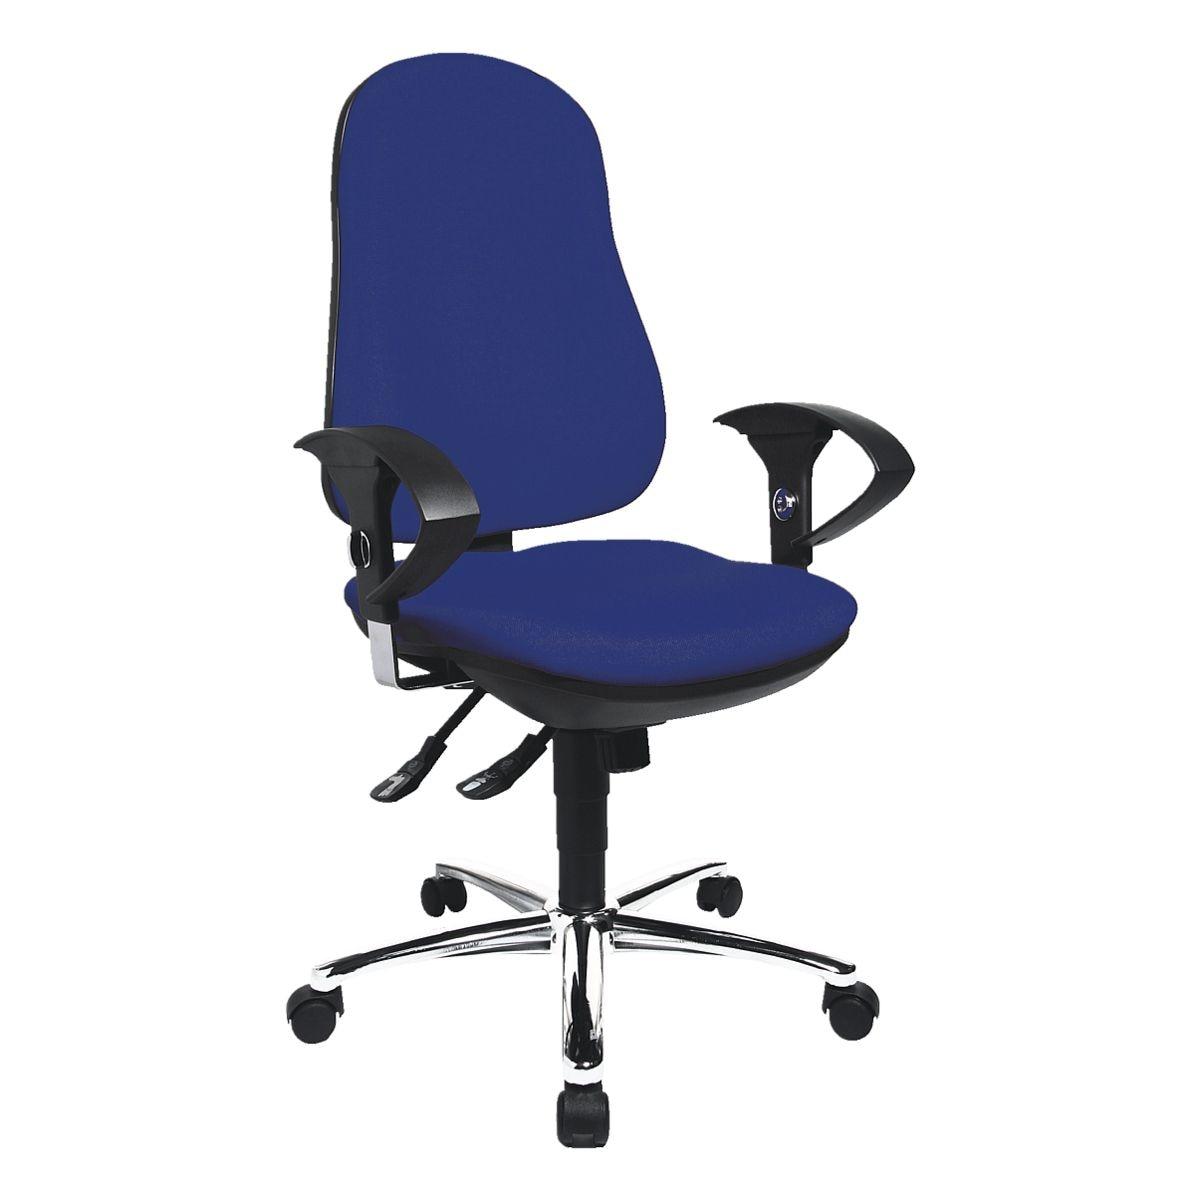 Bürostuhl Topstar »Support Deluxe« mit Armlehnen